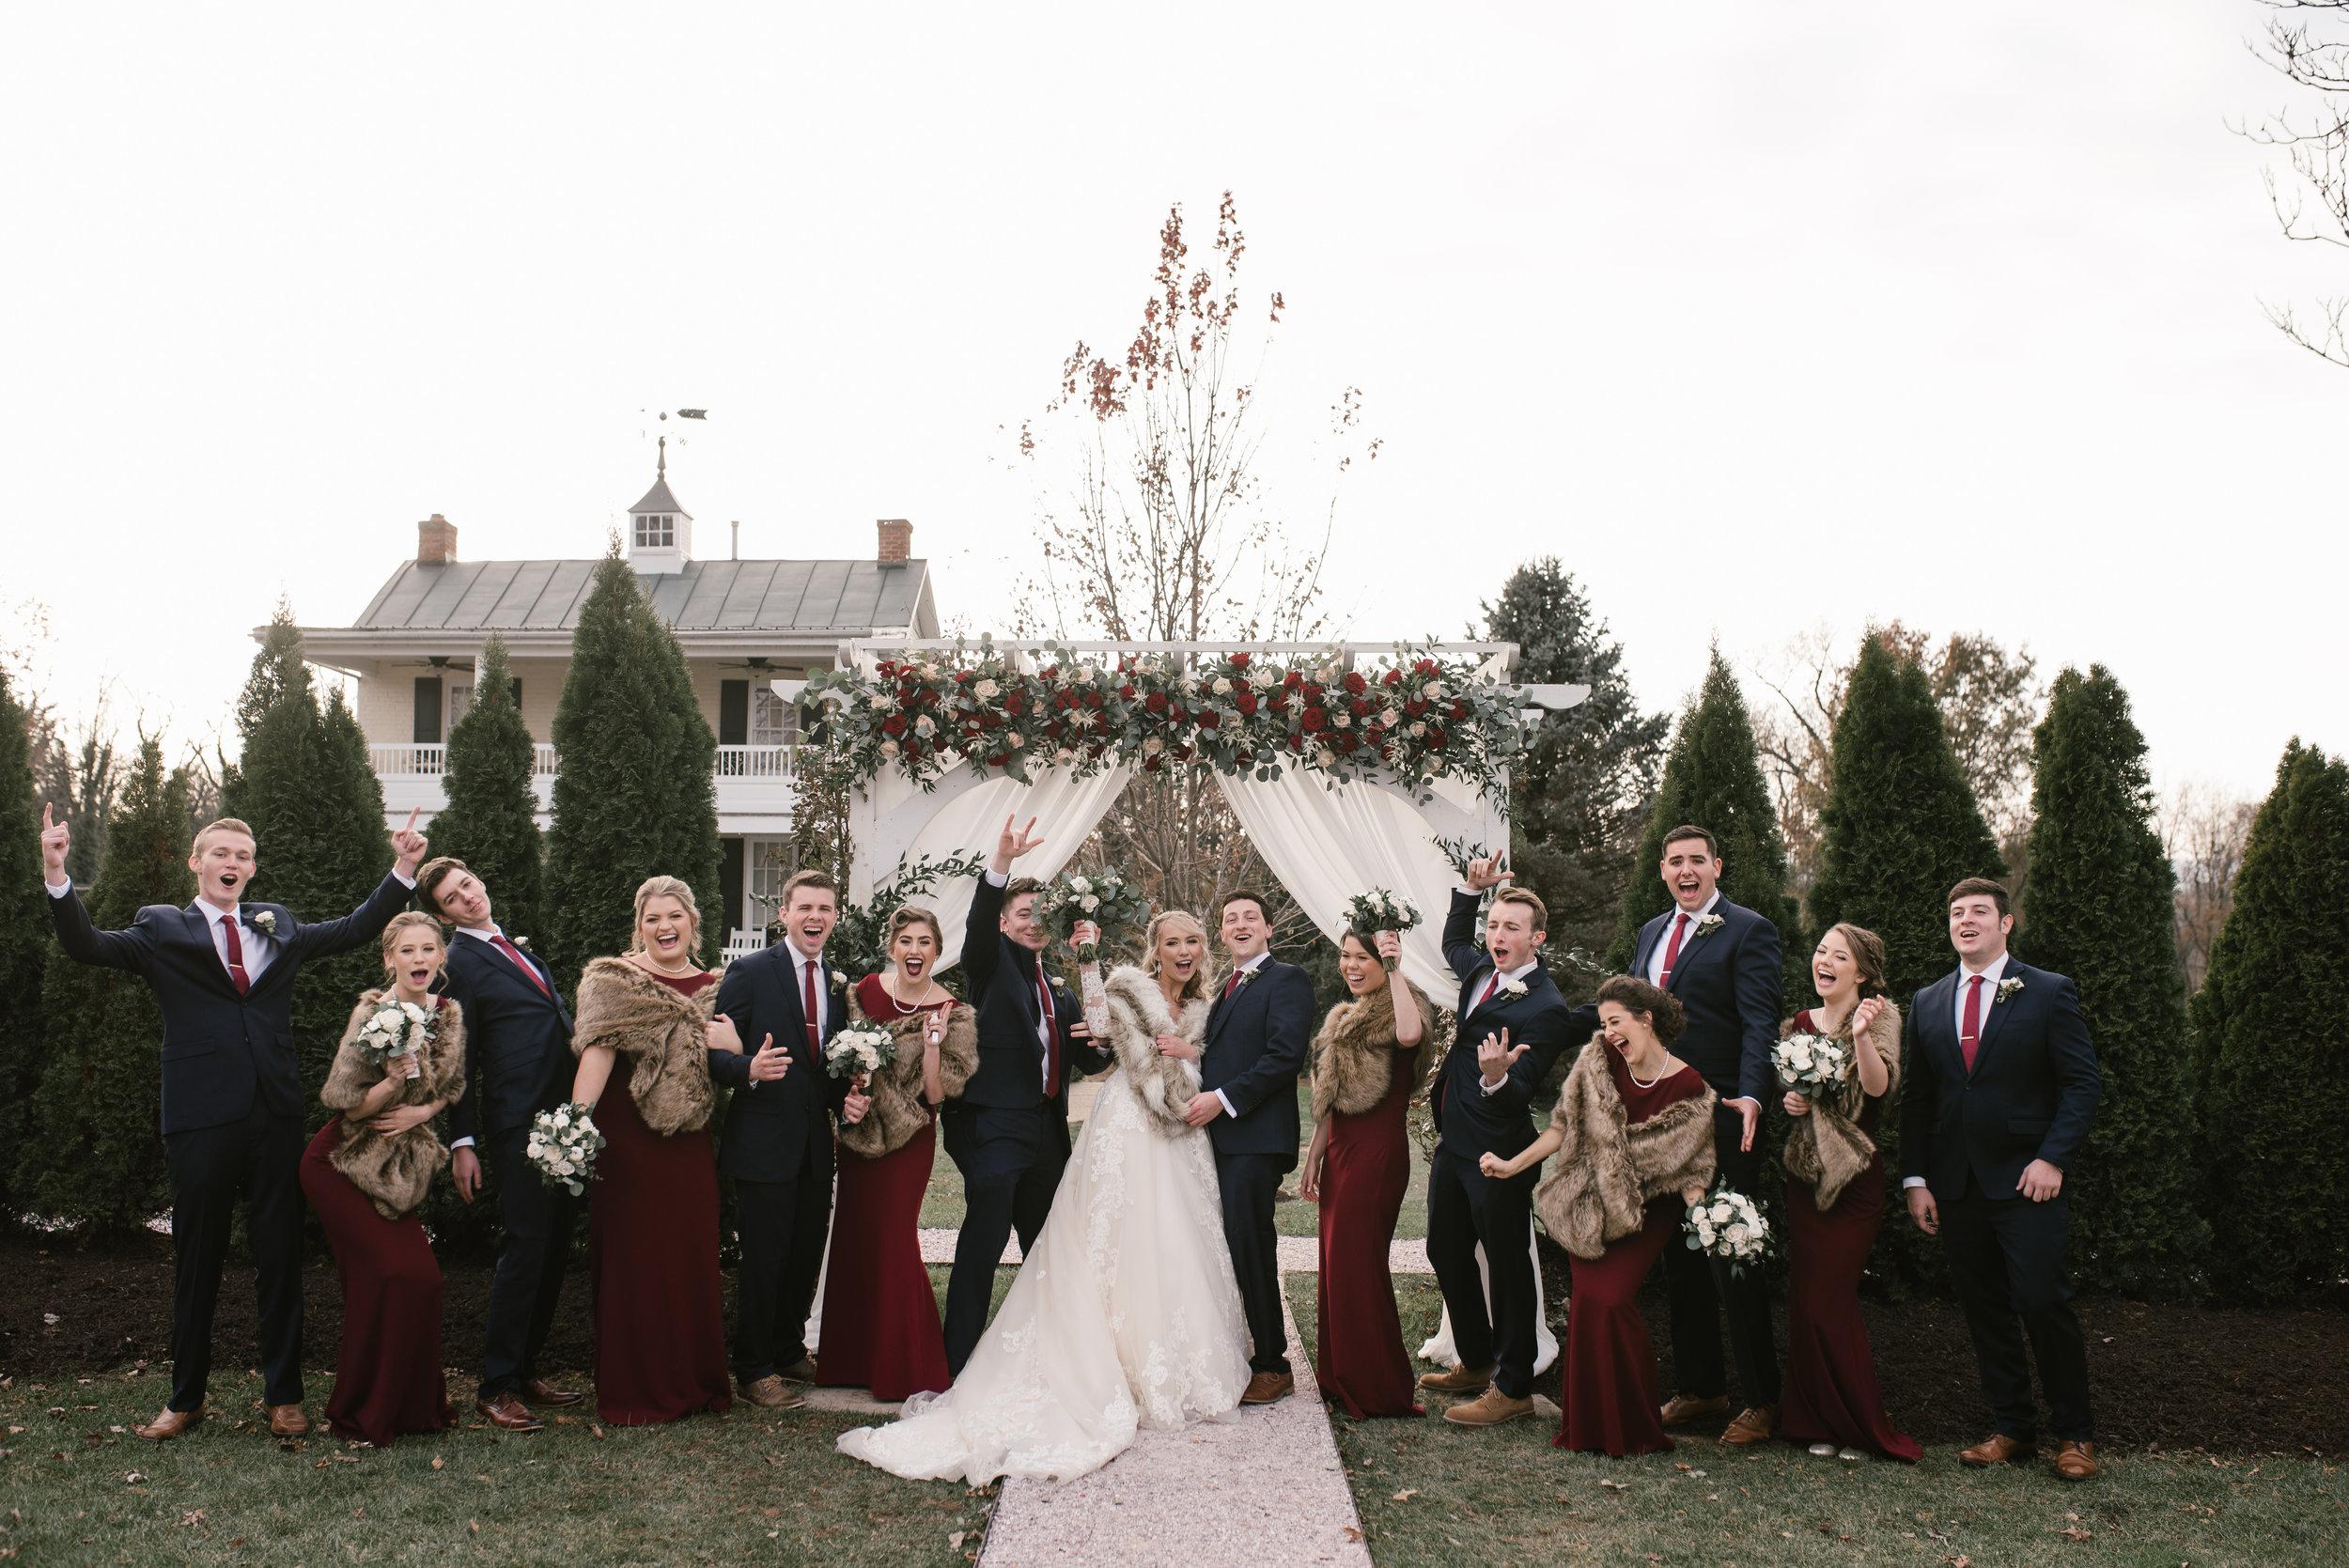 antrim-18444-spencer-wedding-1034.jpg